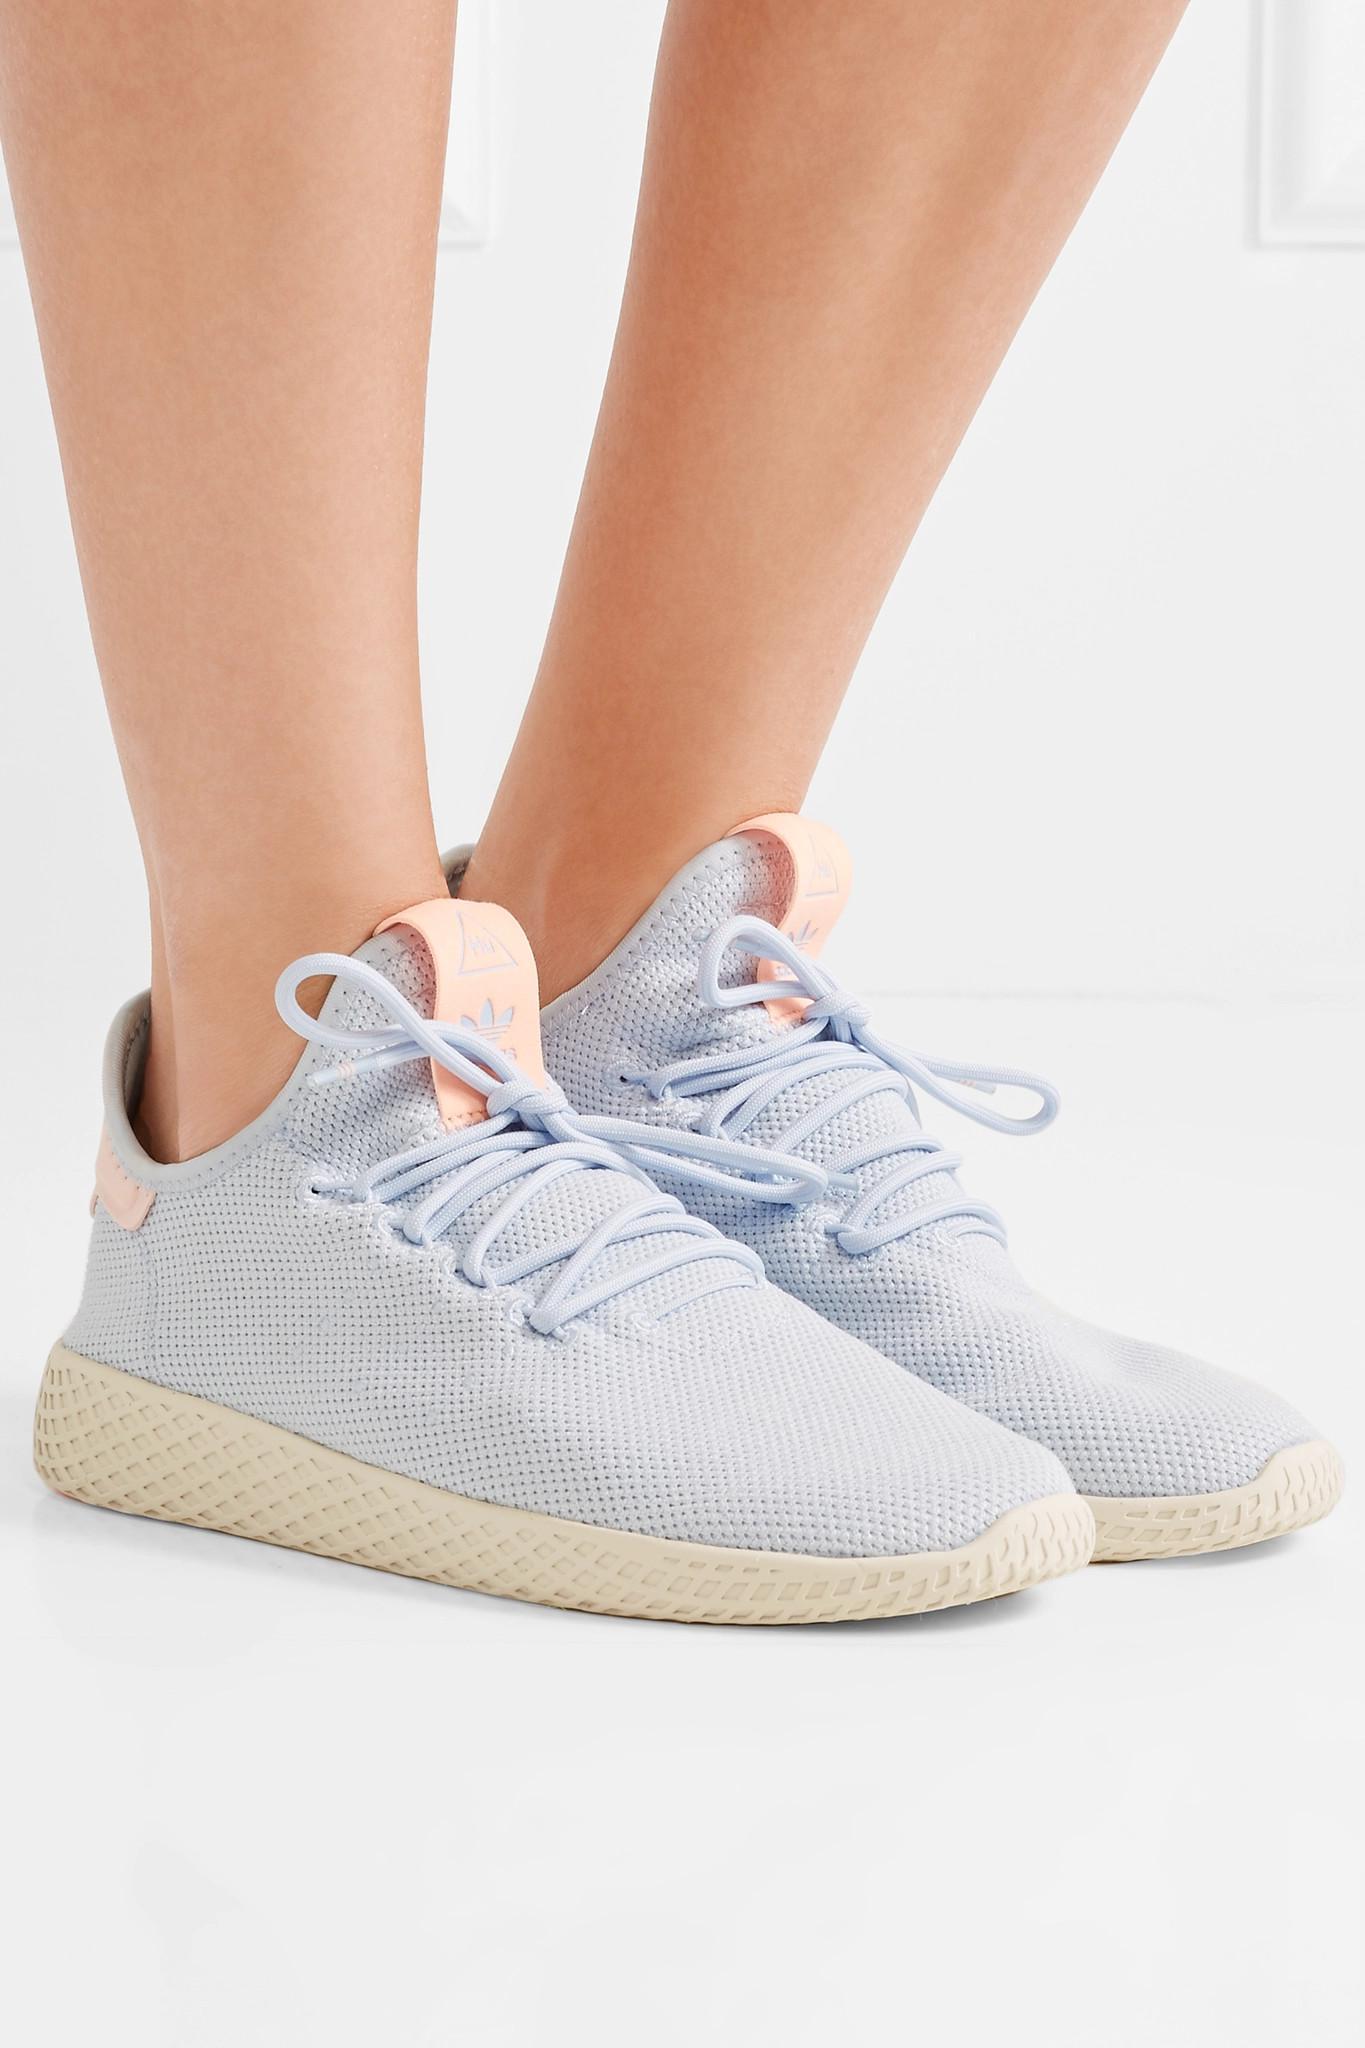 702e5e7b6 Adidas Originals - Blue Pharrell Williams Tennis Hu Primeknit Sneakers -  Lyst. View fullscreen